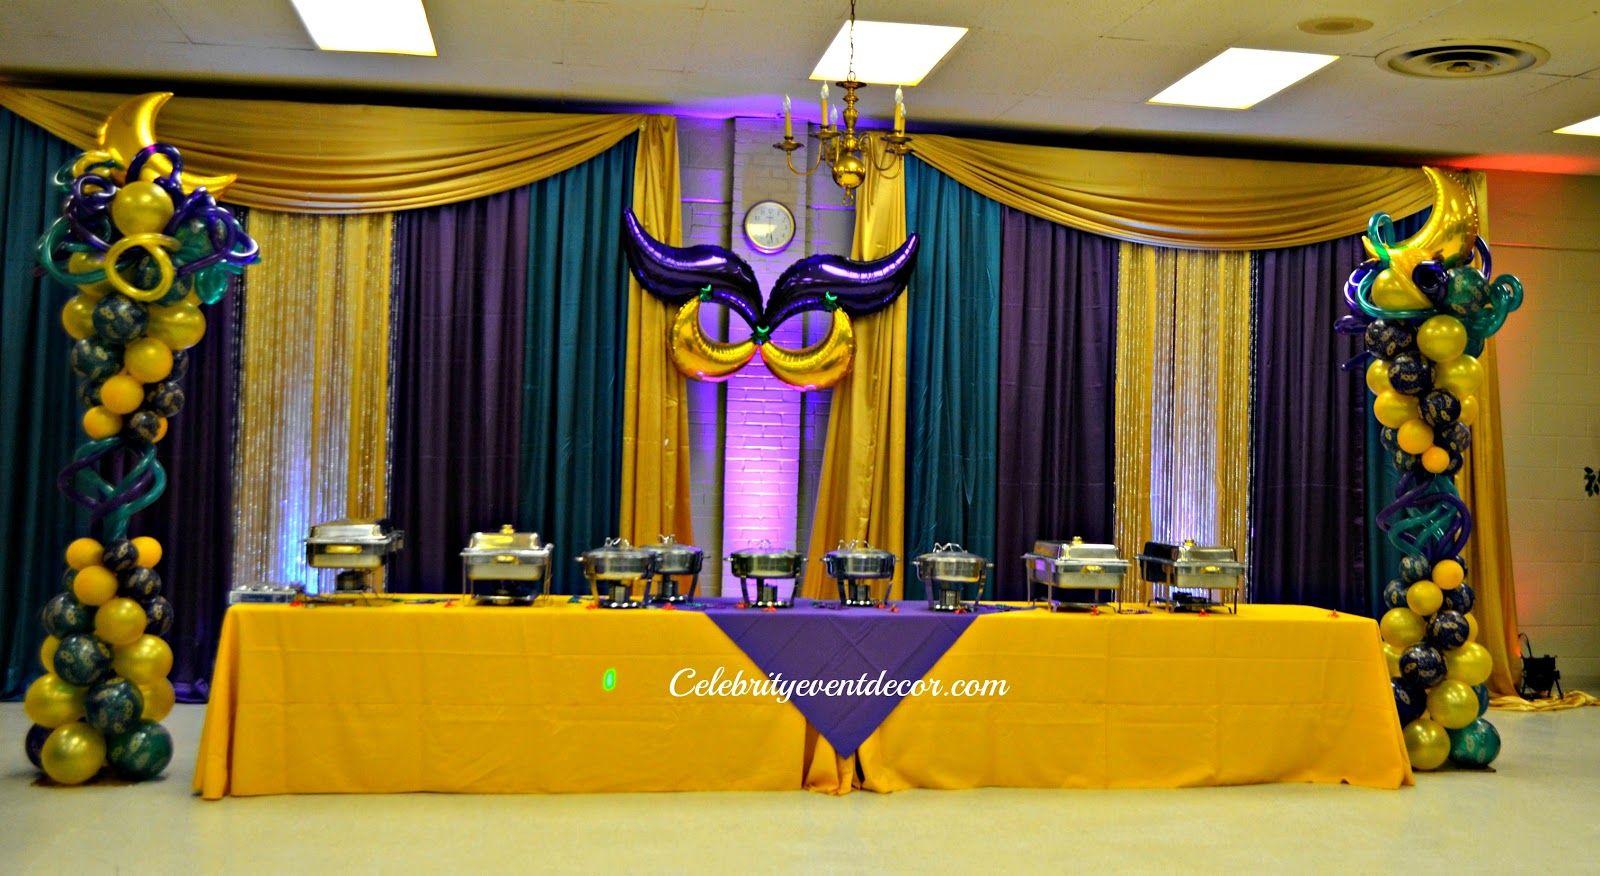 Celebrity Event Decor & Banquet Hall, LLC: November 2012 | Mardi ...